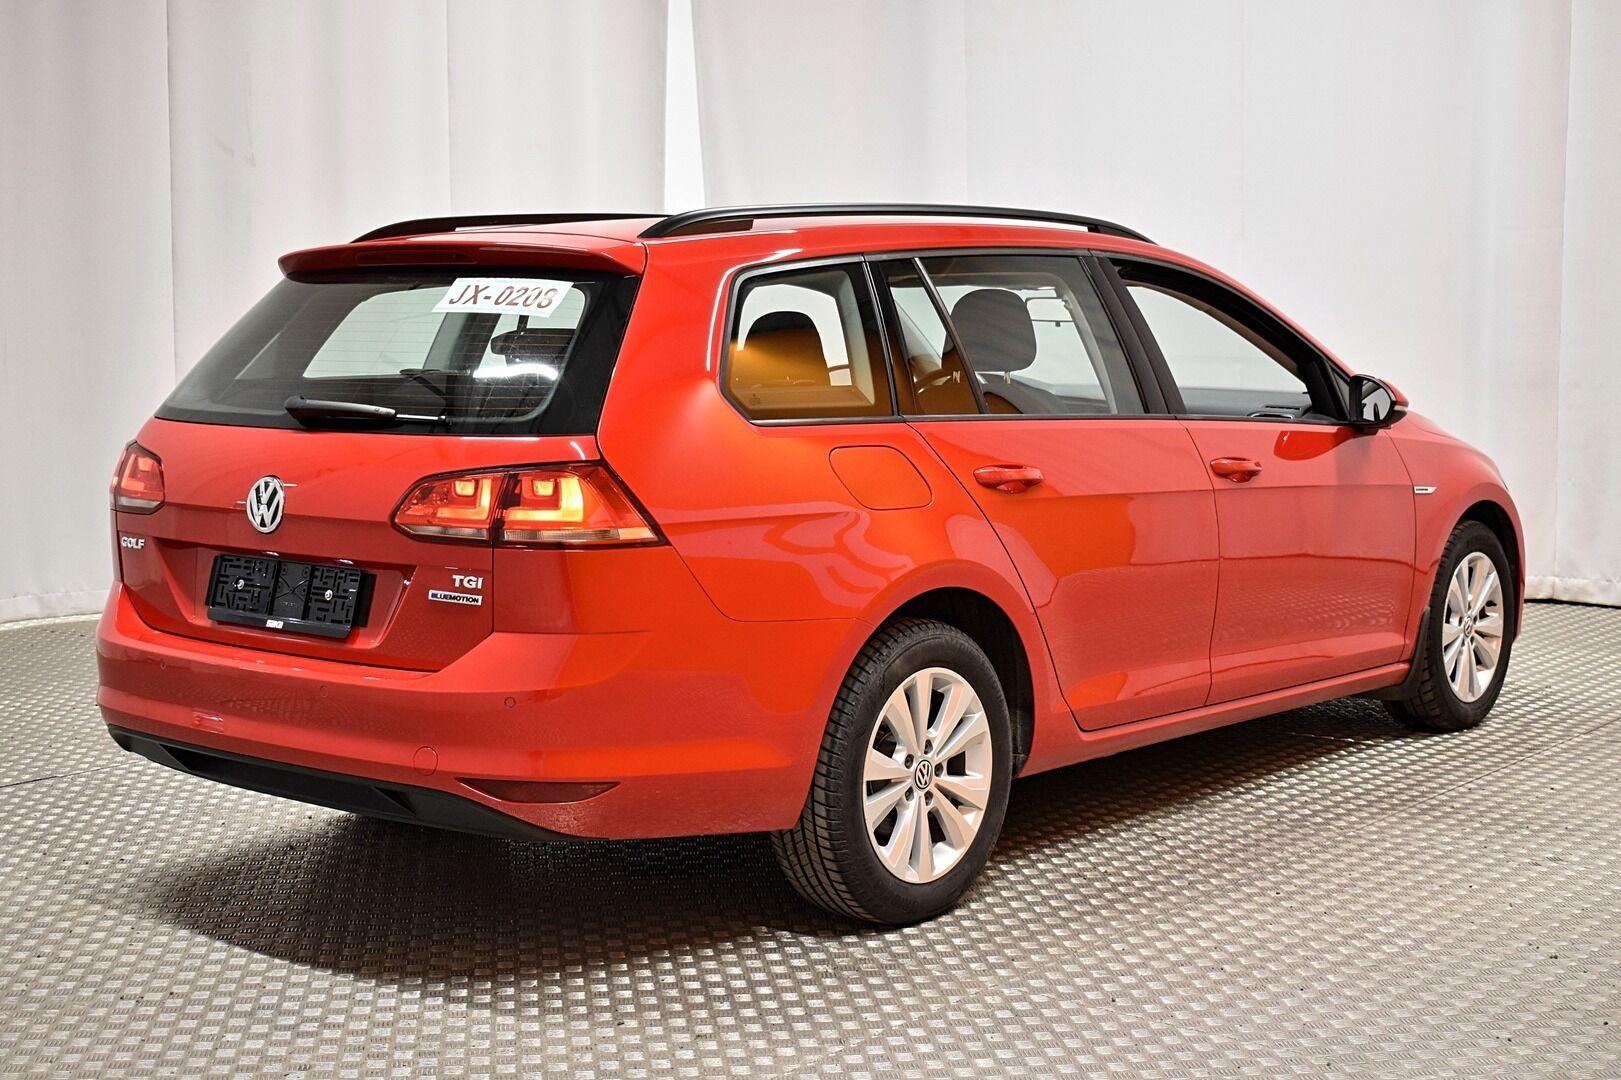 Punainen Farmari, Volkswagen Golf – LEM-79340, kuva 2